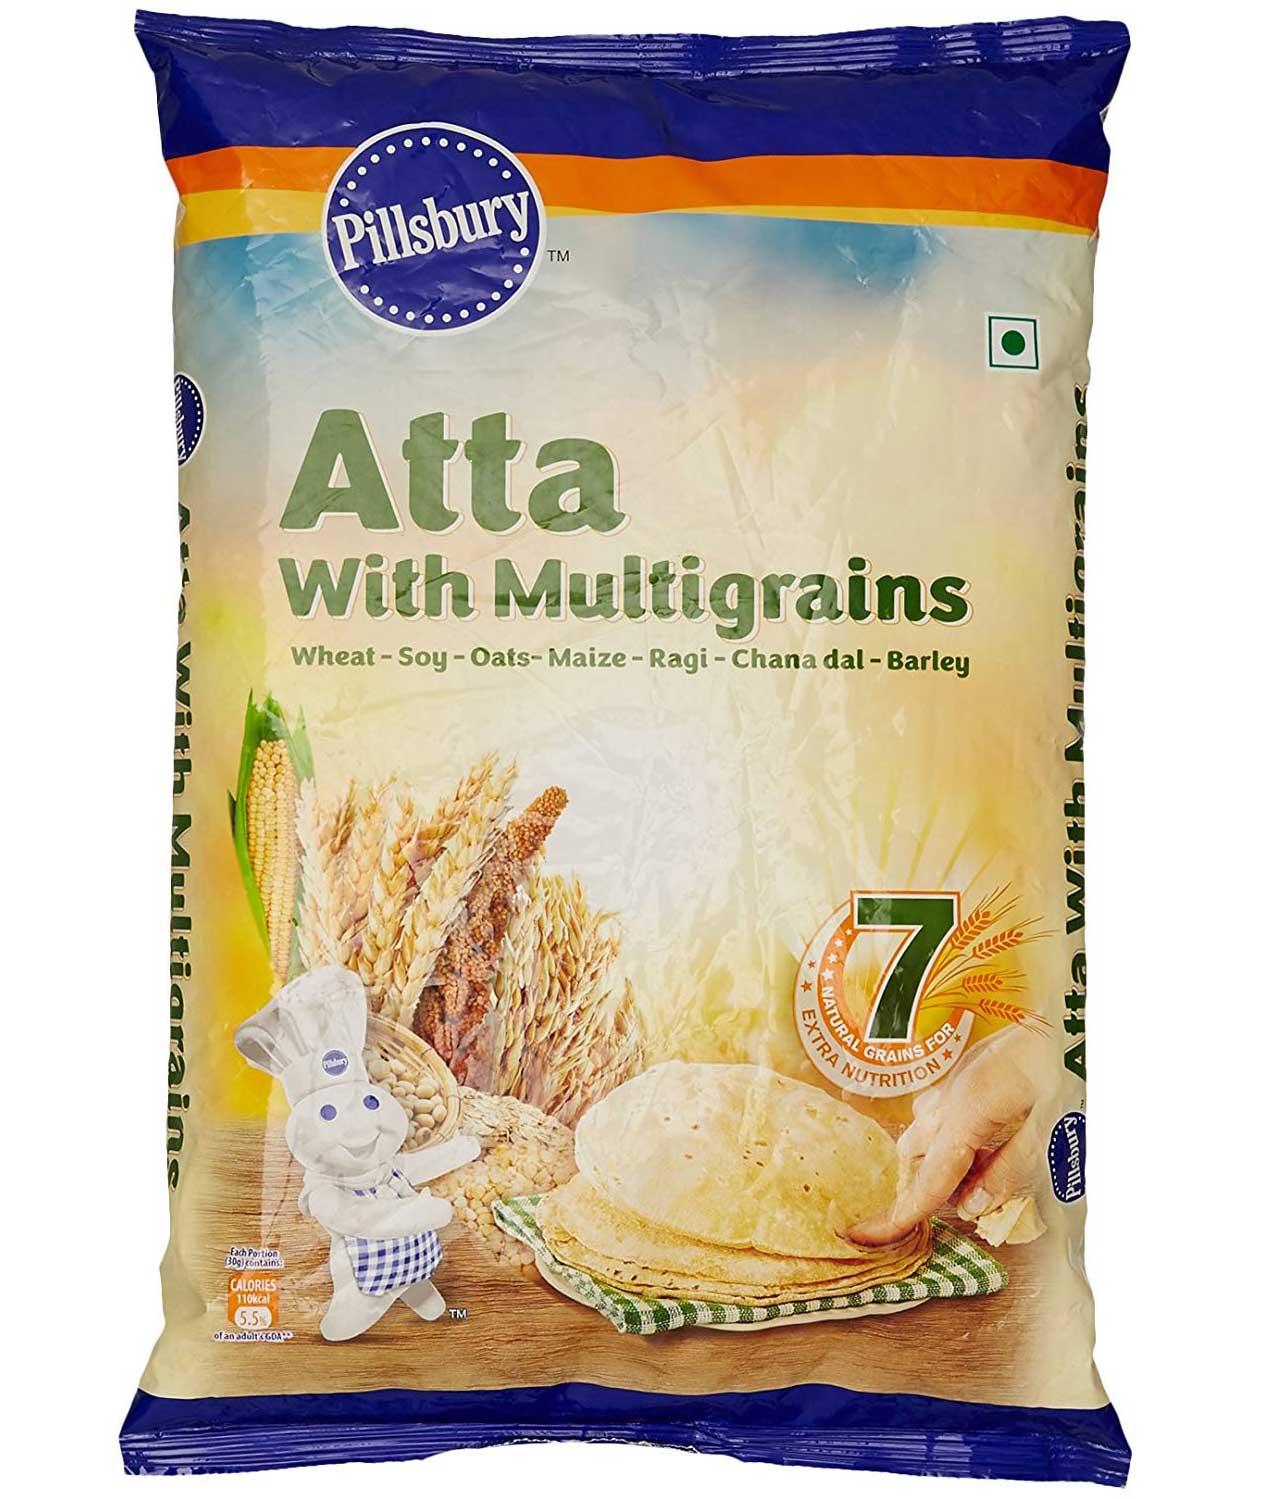 Pillsbury Multi Grain Atta, 5kg (North)